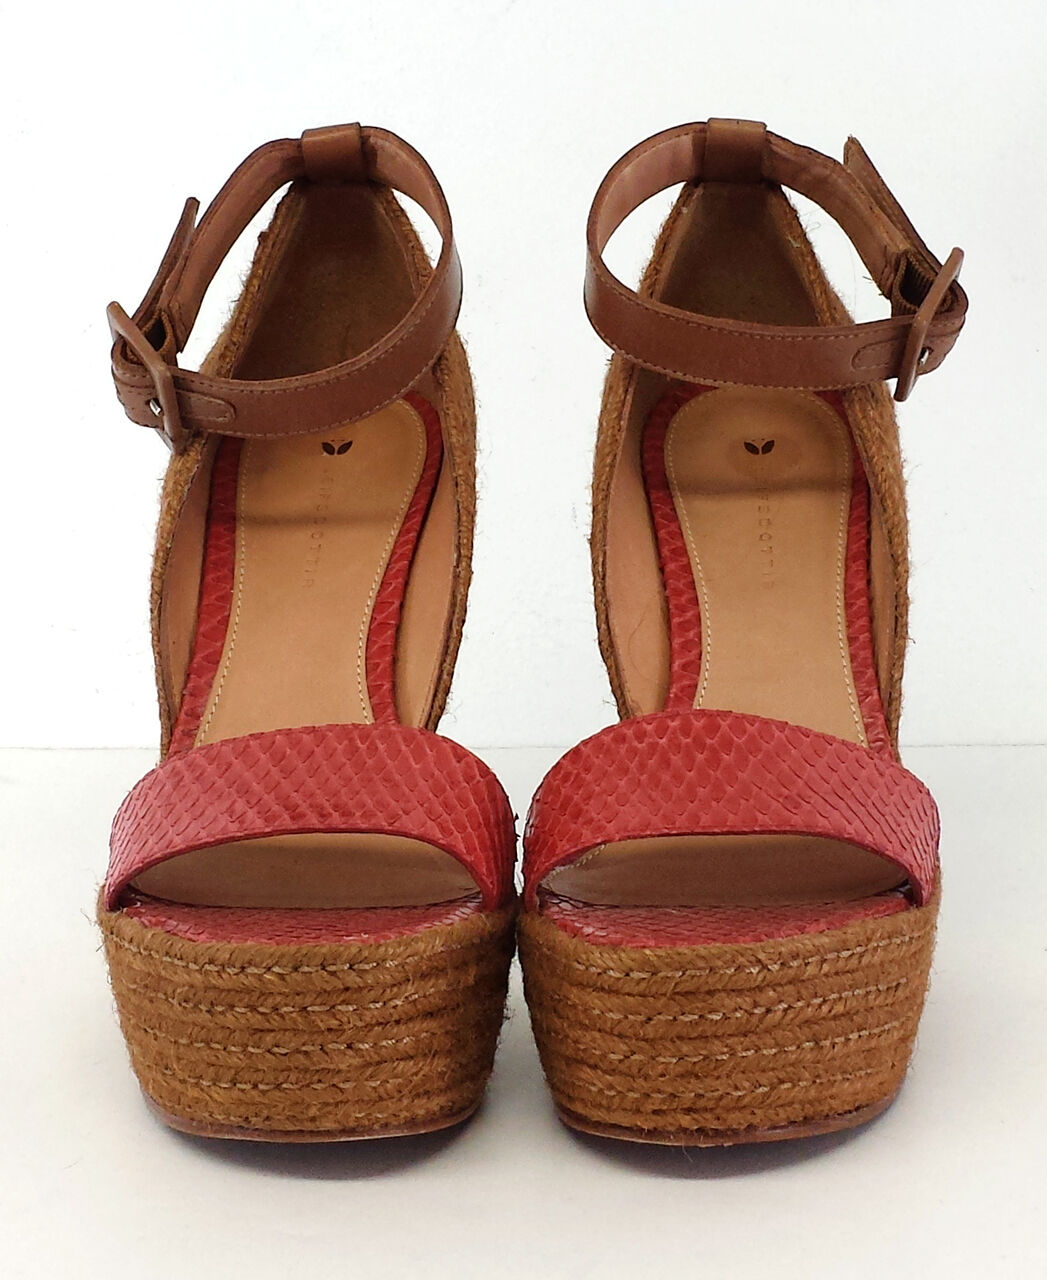 prima i clienti Anthropologie Leifsdottir rosso Snakeskin Leather Leather Leather Curved Wedges Sz 38  shopping online e negozio di moda